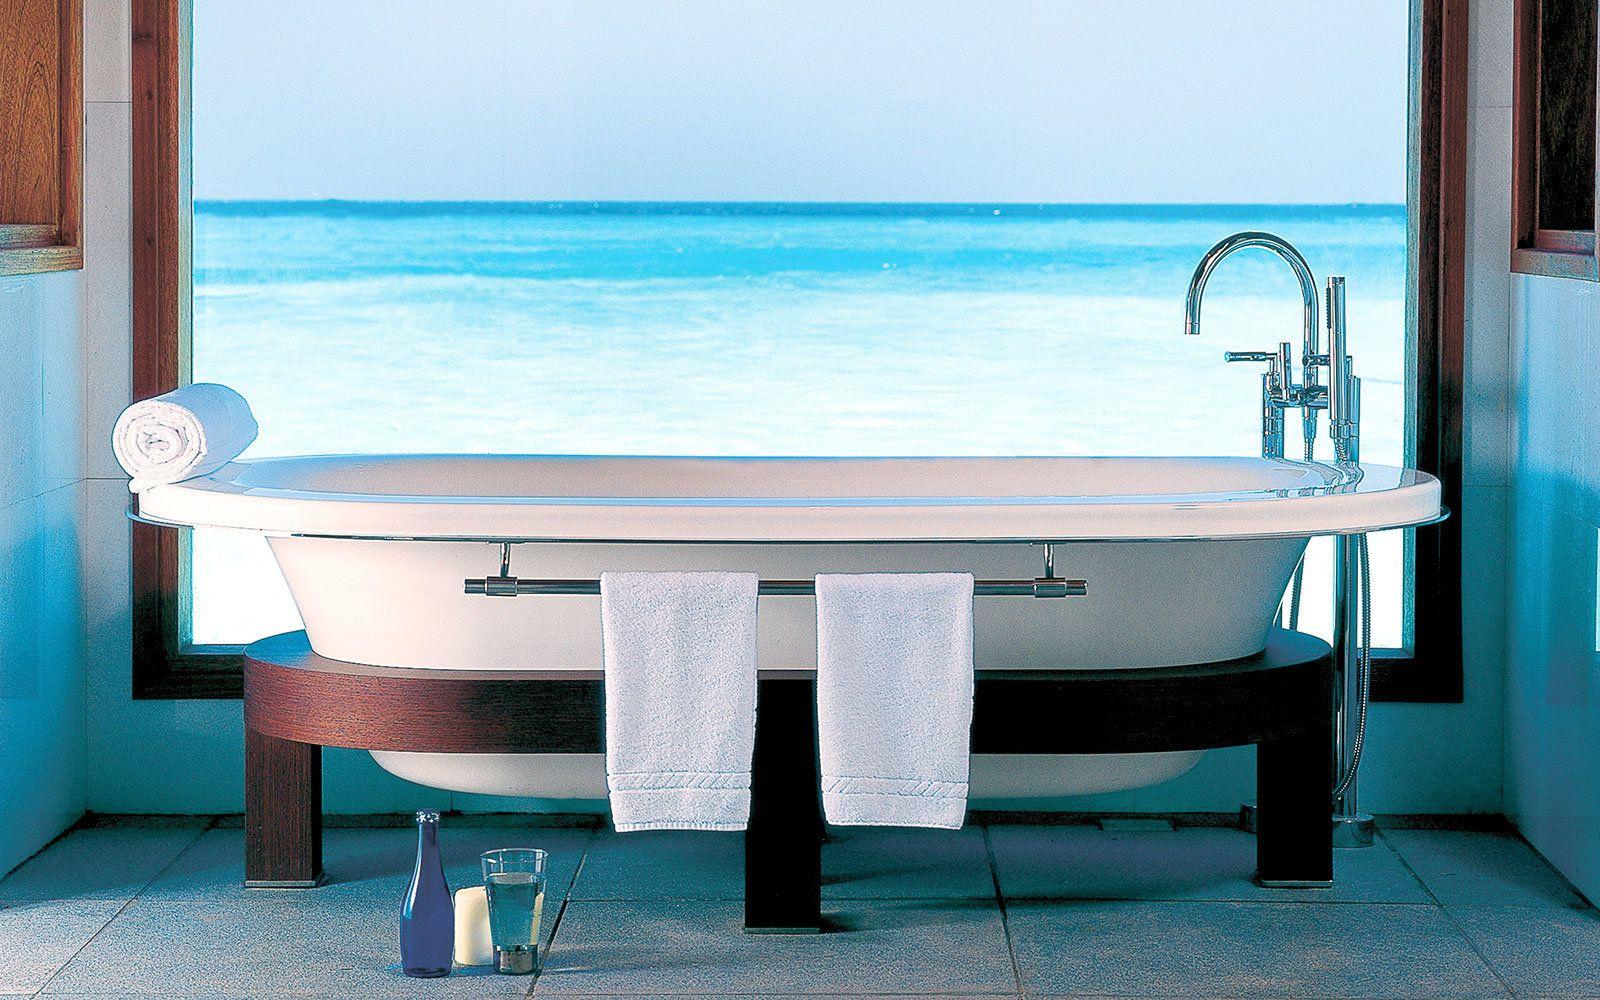 19 Bathtubs Around the World With Breathtaking Views | Bathtubs ...